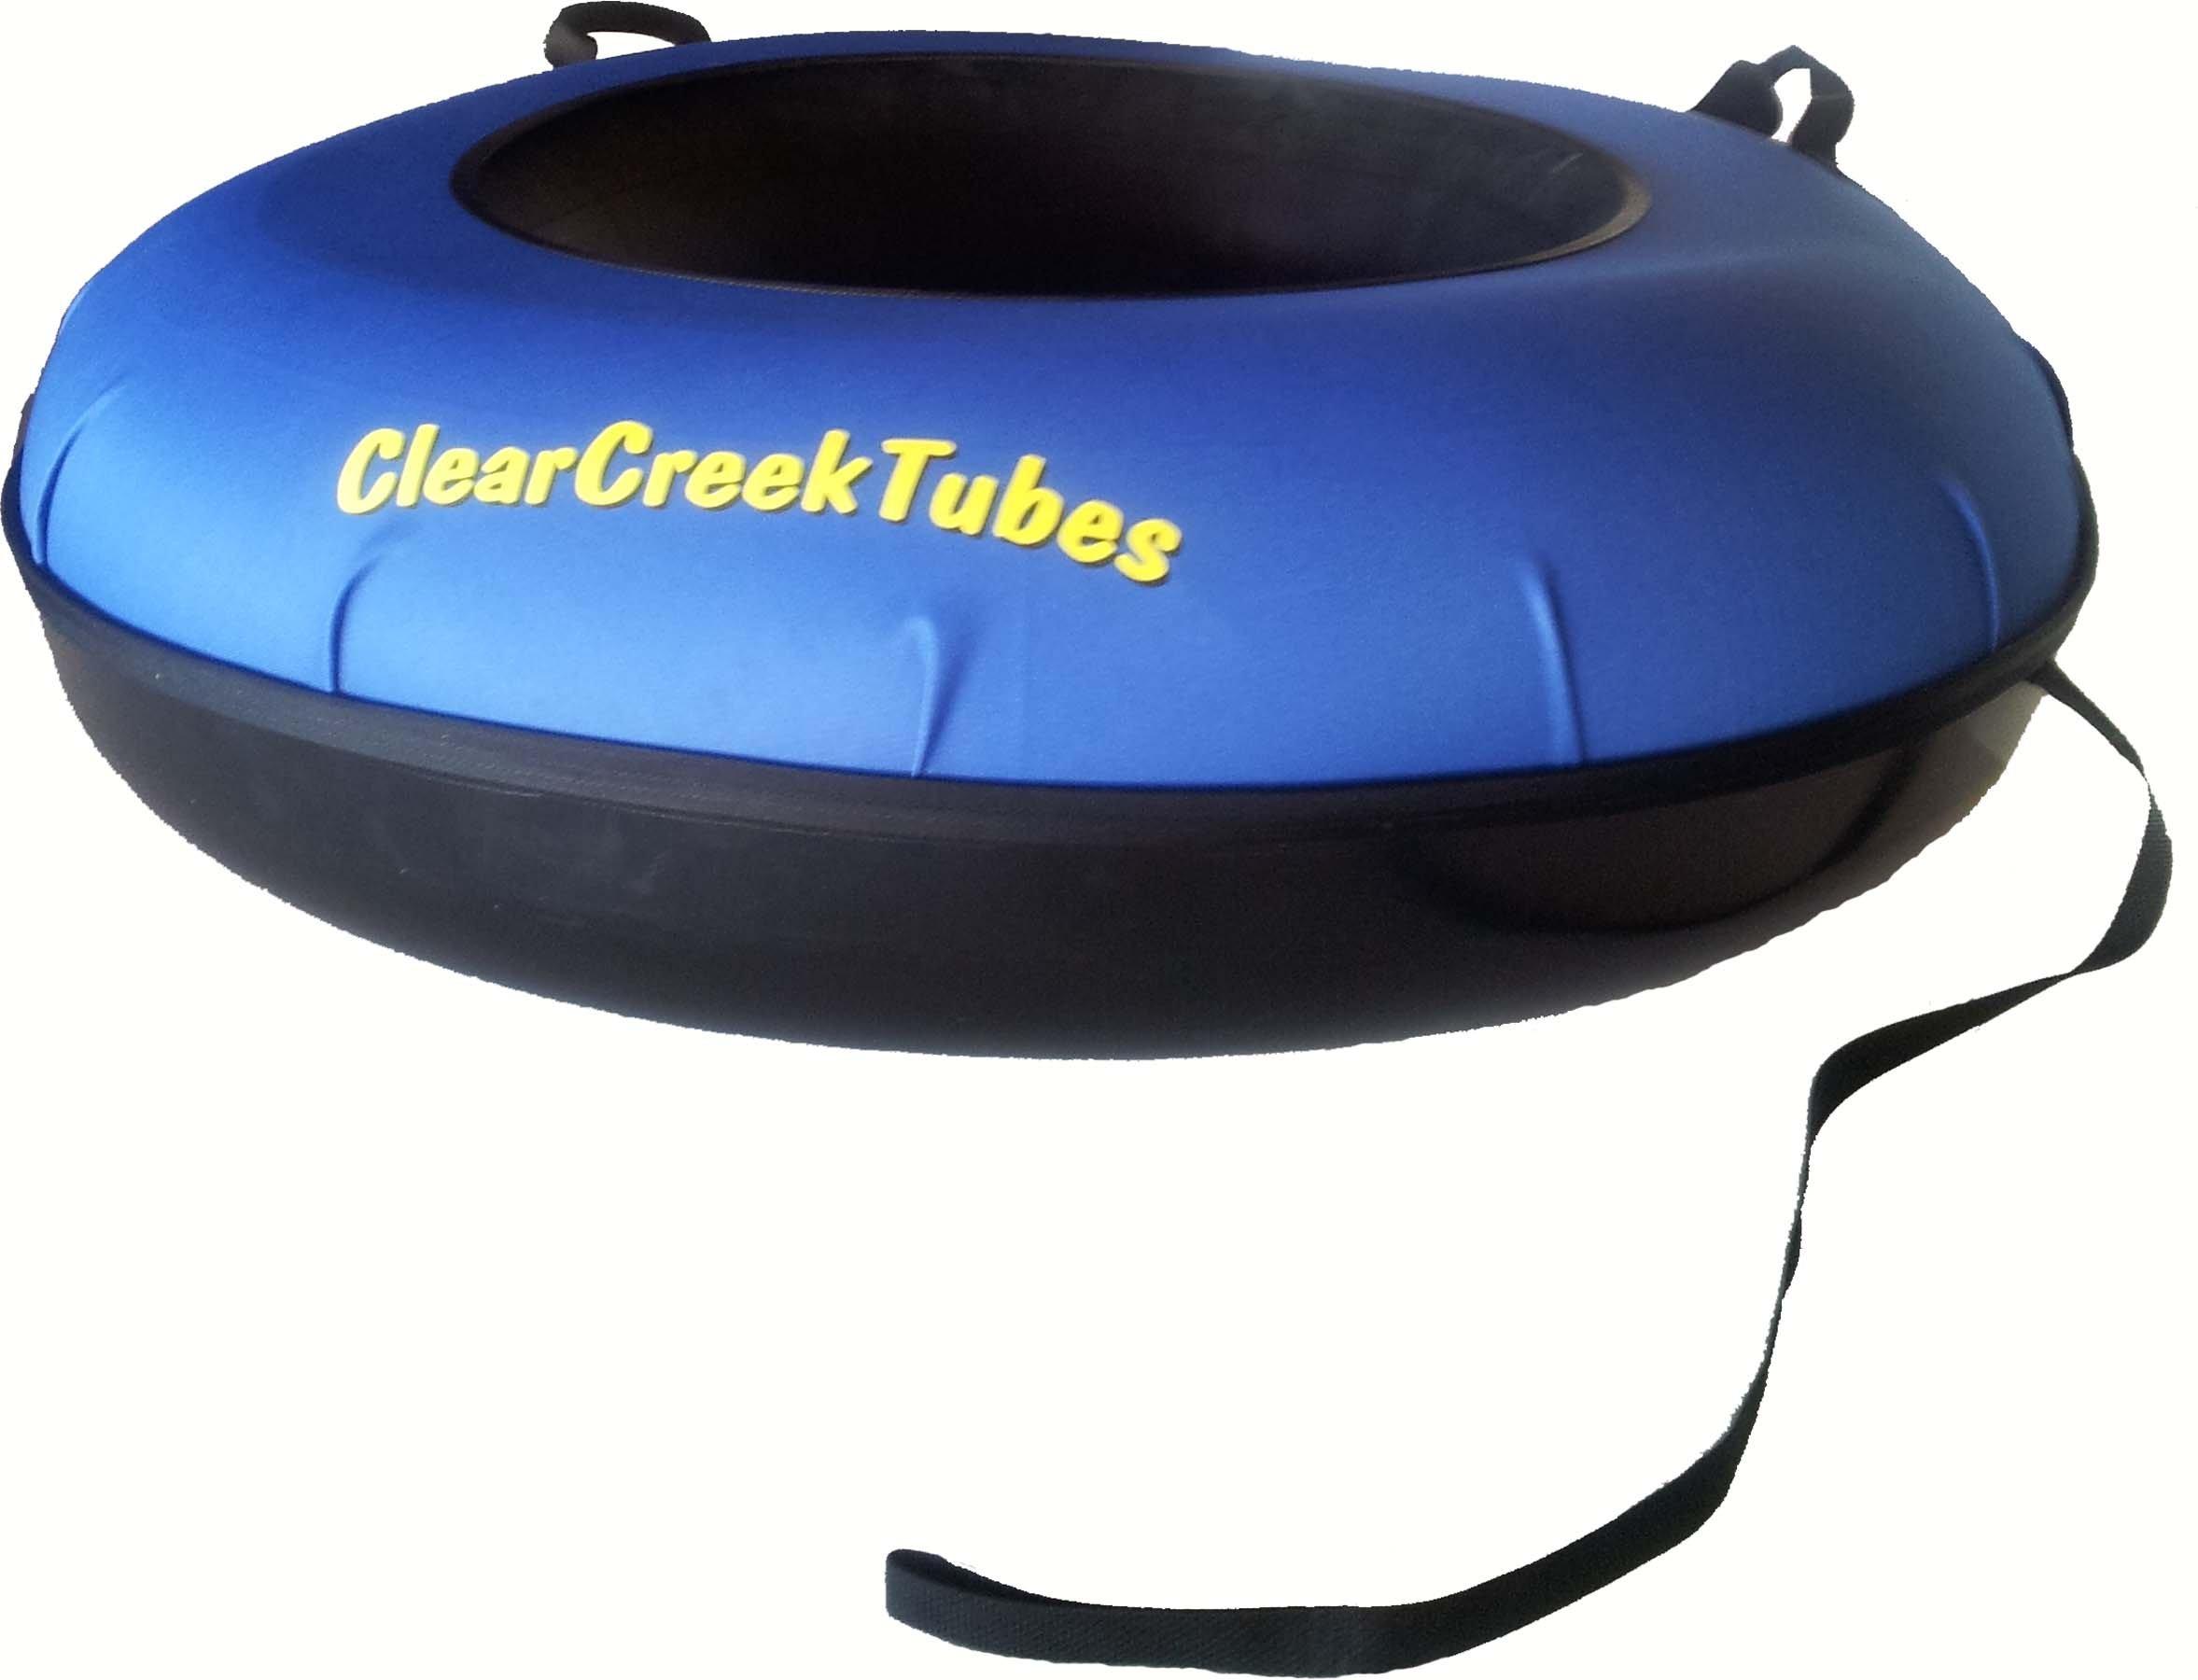 ClearCreekTubes Hard Shell Bottom Snow Tube 44''